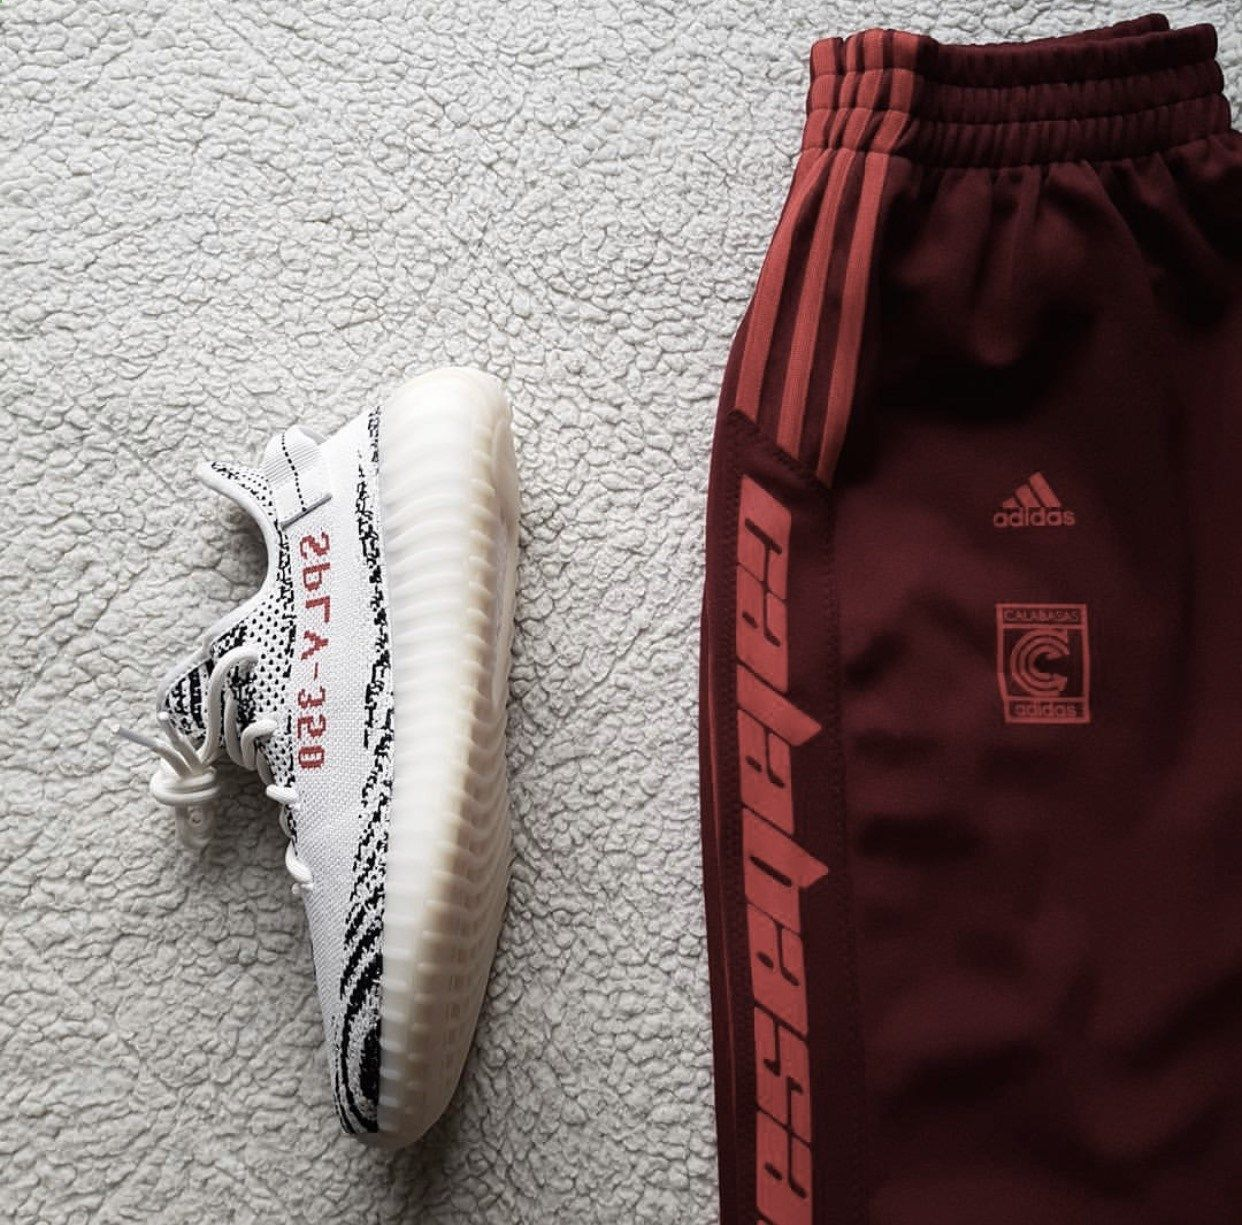 online retailer 02572 869ec Adidas Yeezy Boost 350 V2 Zebra with all-new Calabasas sweat pants.